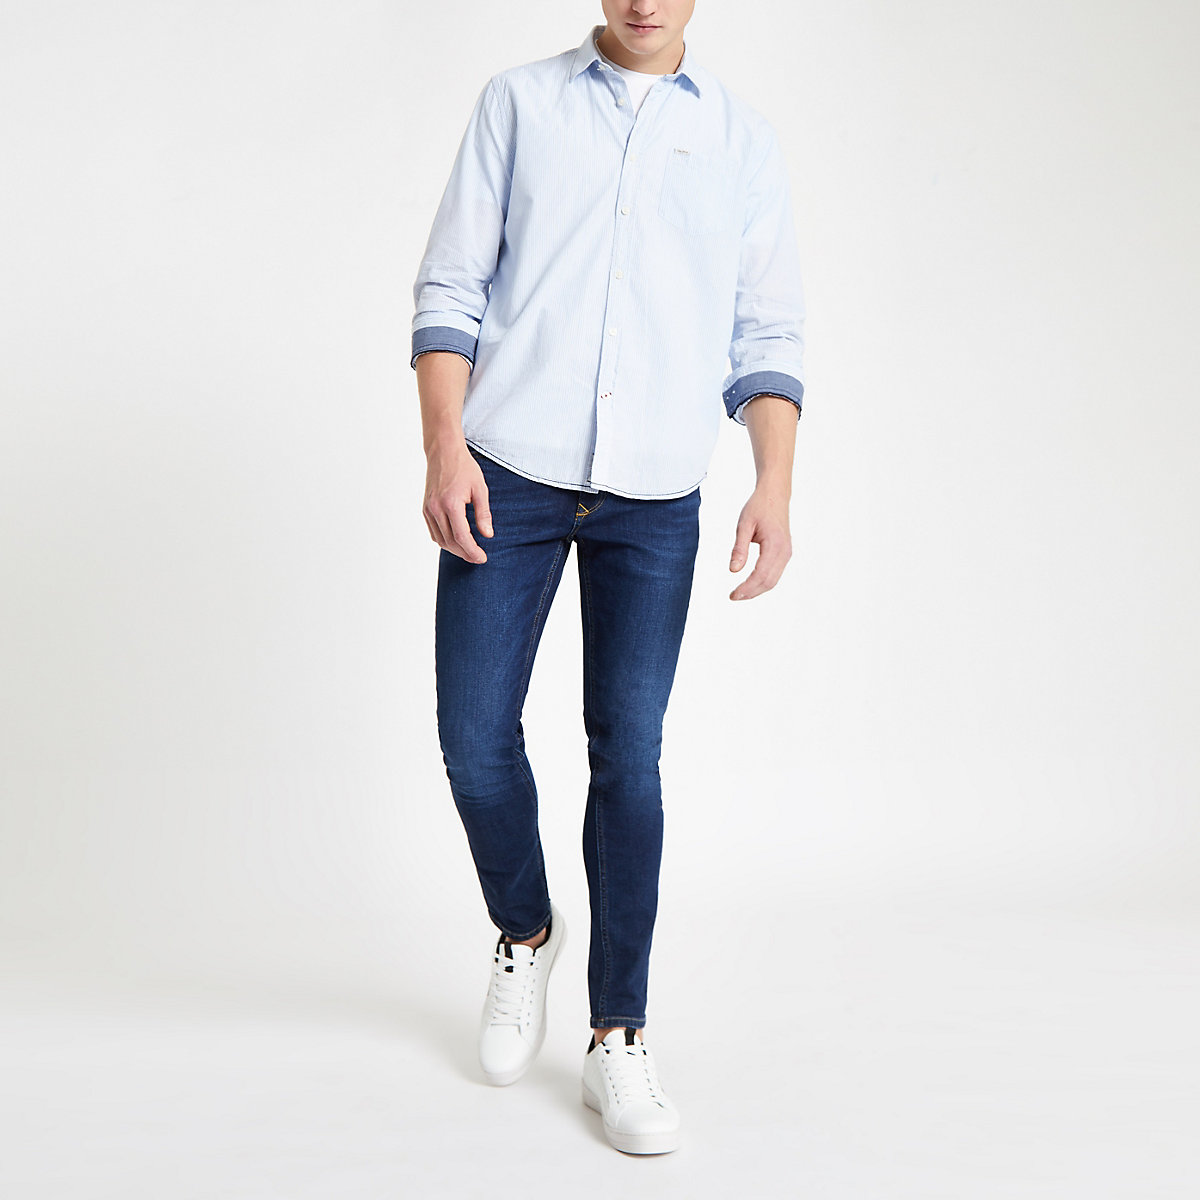 Pepe Jeans blue pinstripe shirt